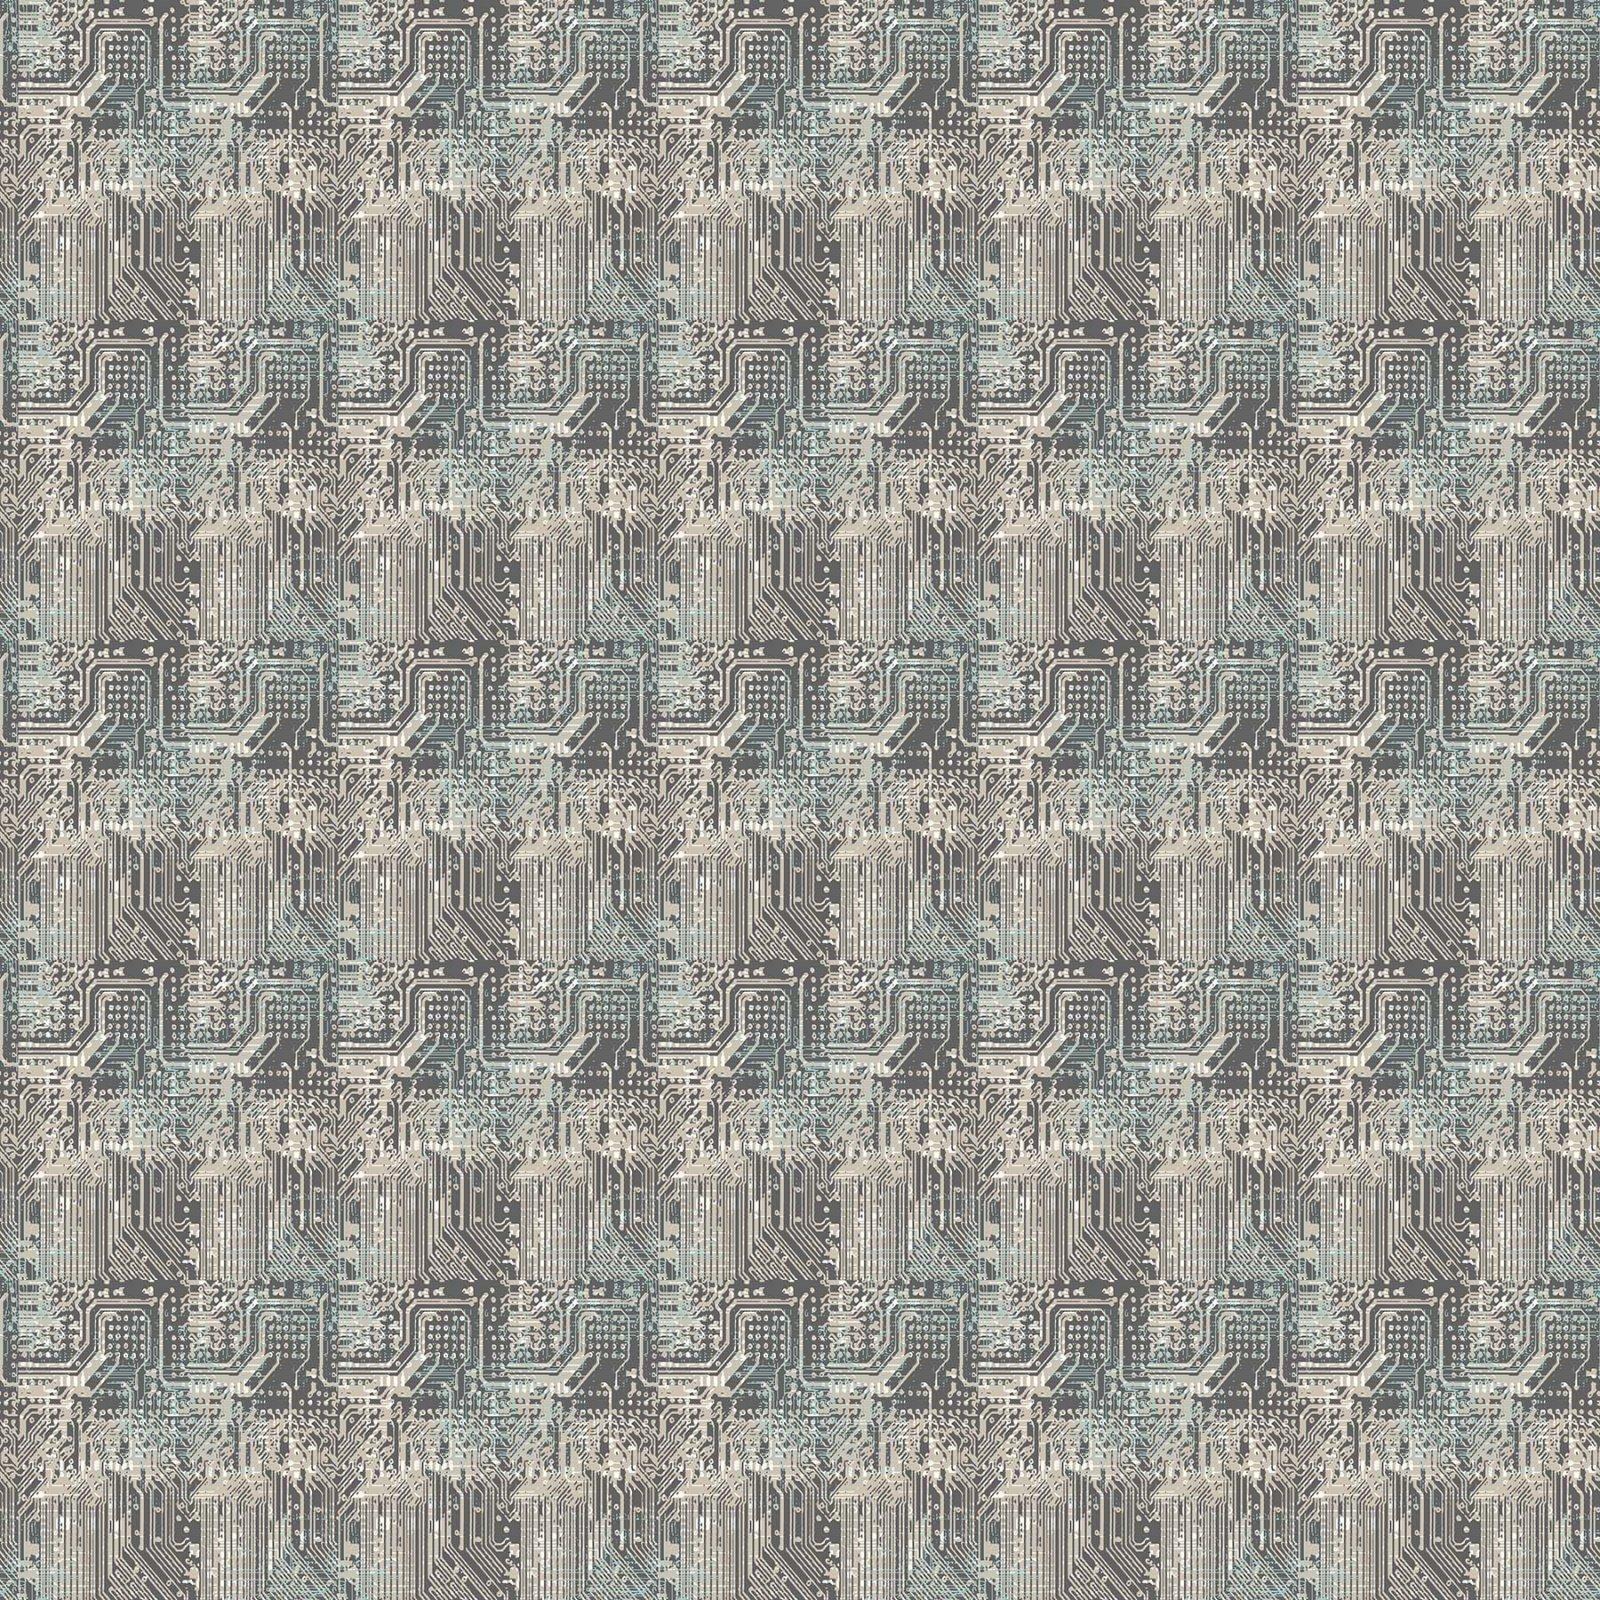 Urban Grunge 22678 (color 12)